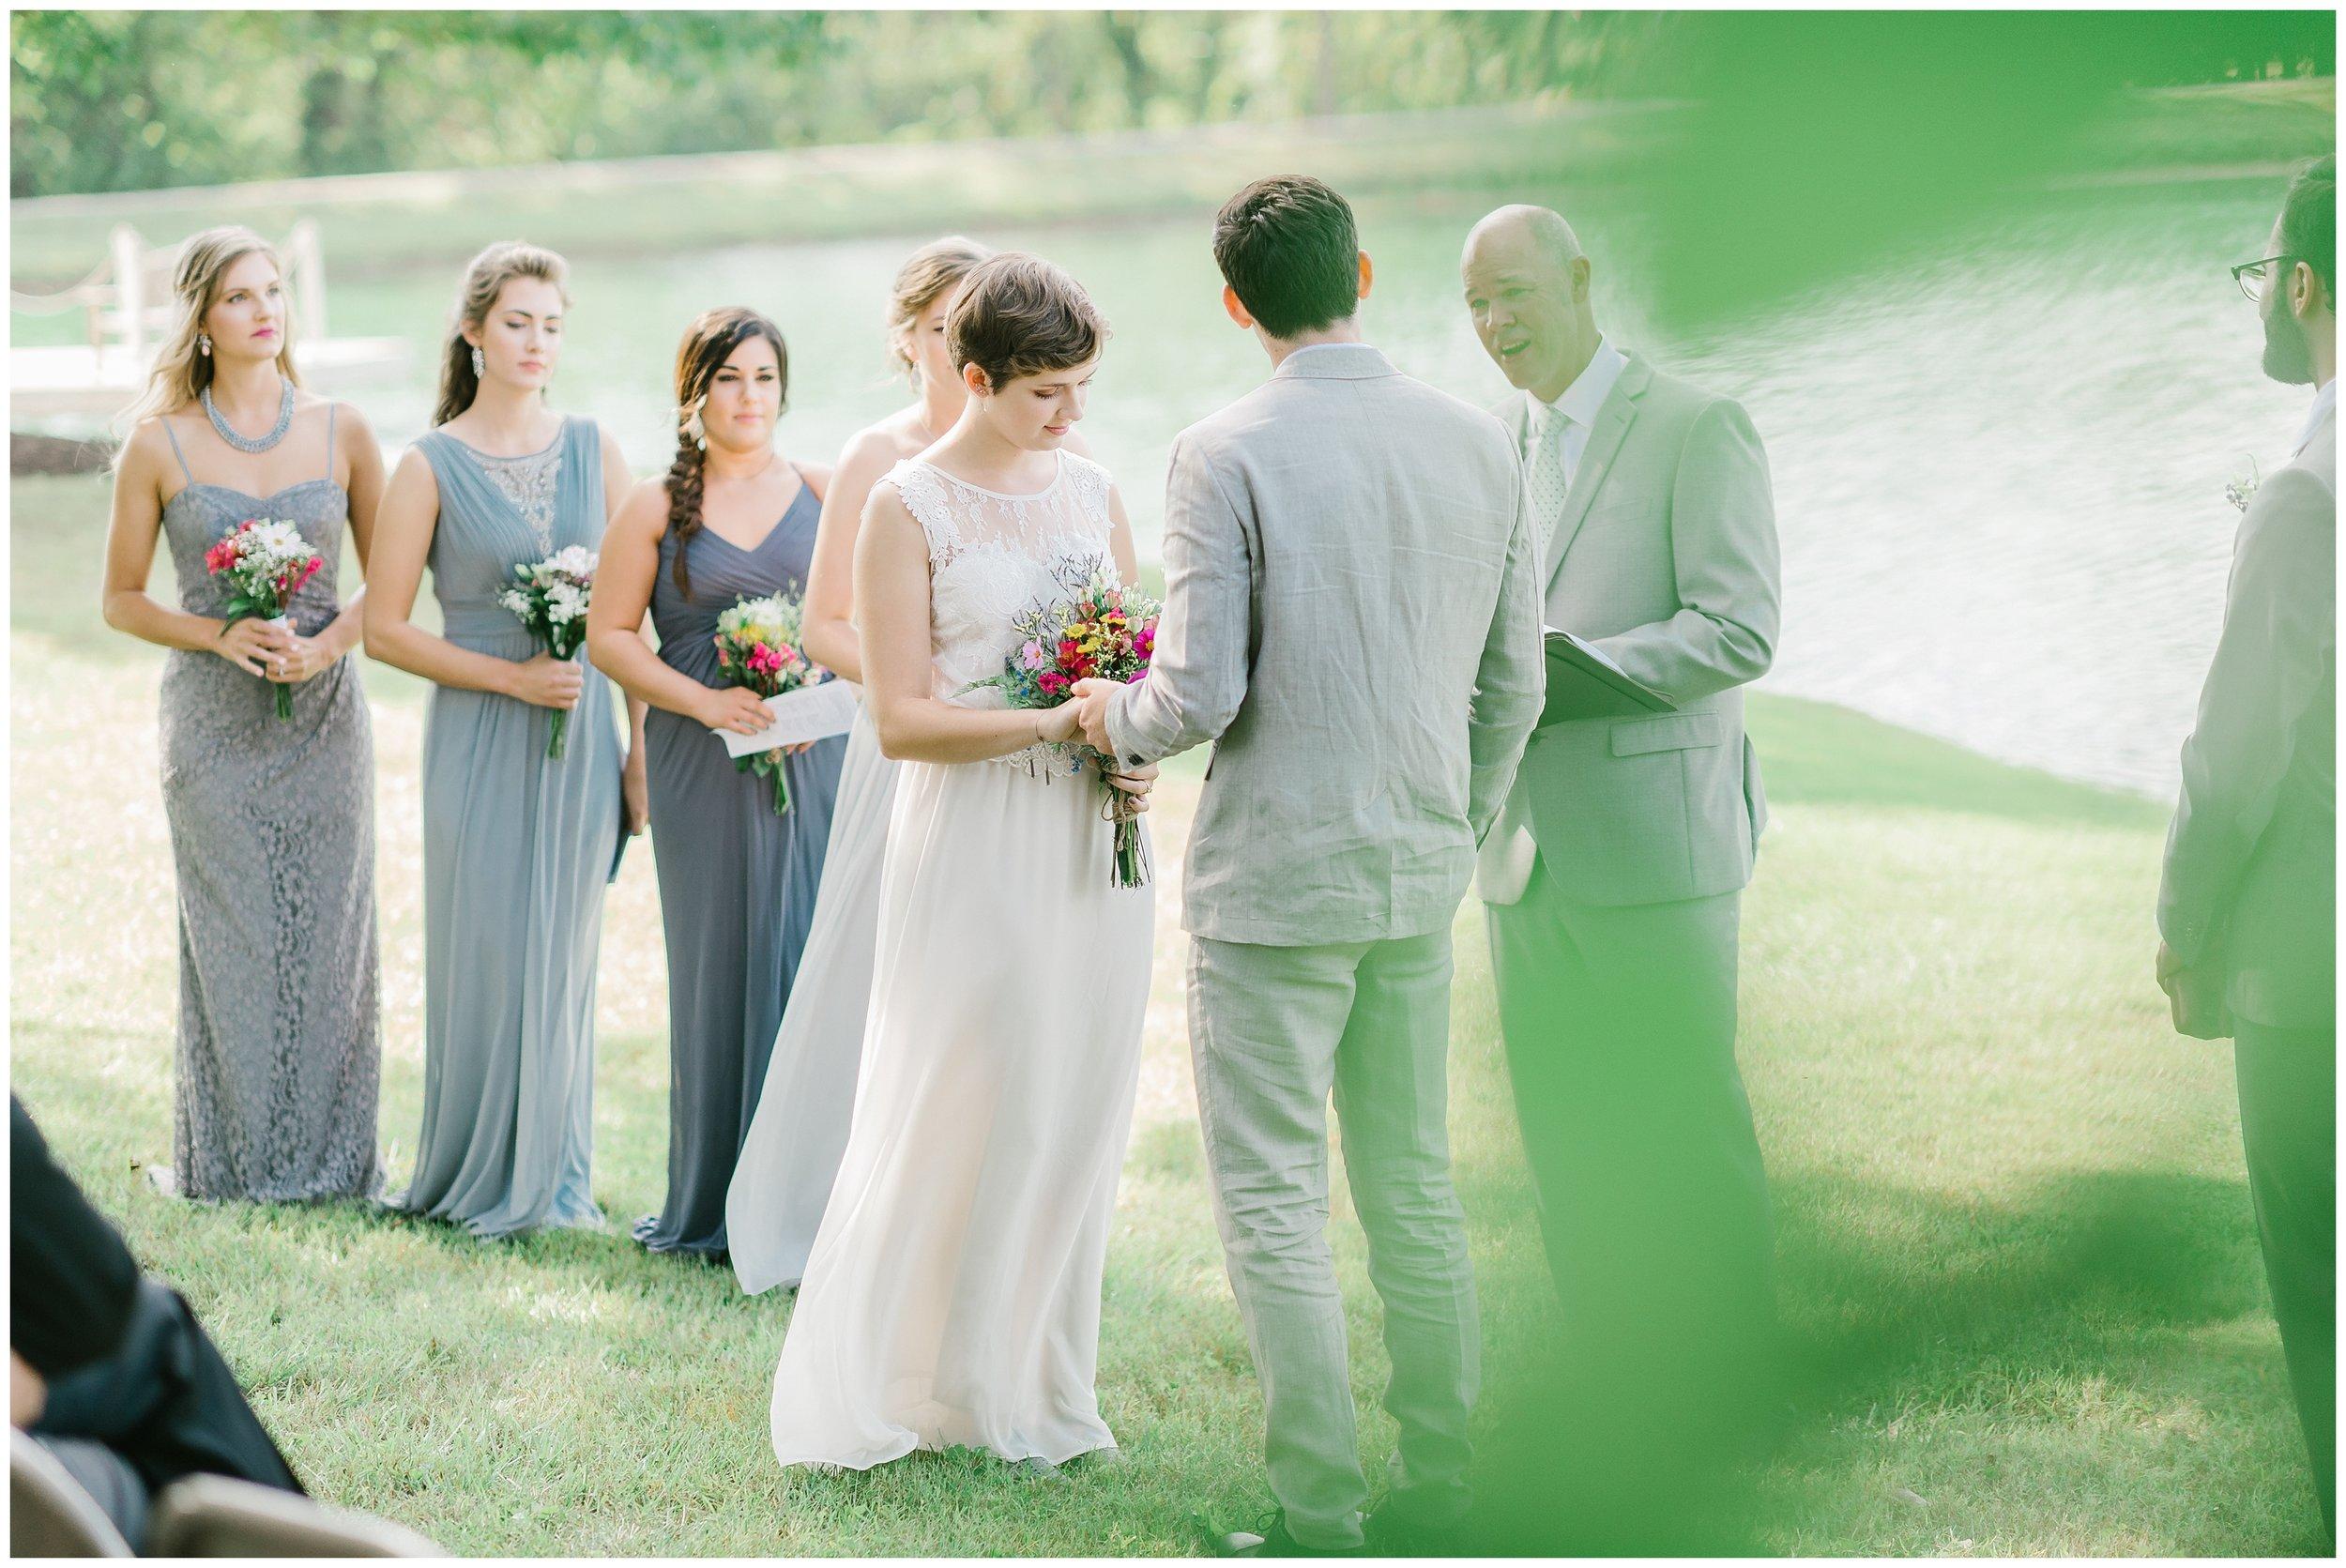 Rebecca_Shehorn_Photography_Indianapolis_Wedding_Photographer_7256.jpg